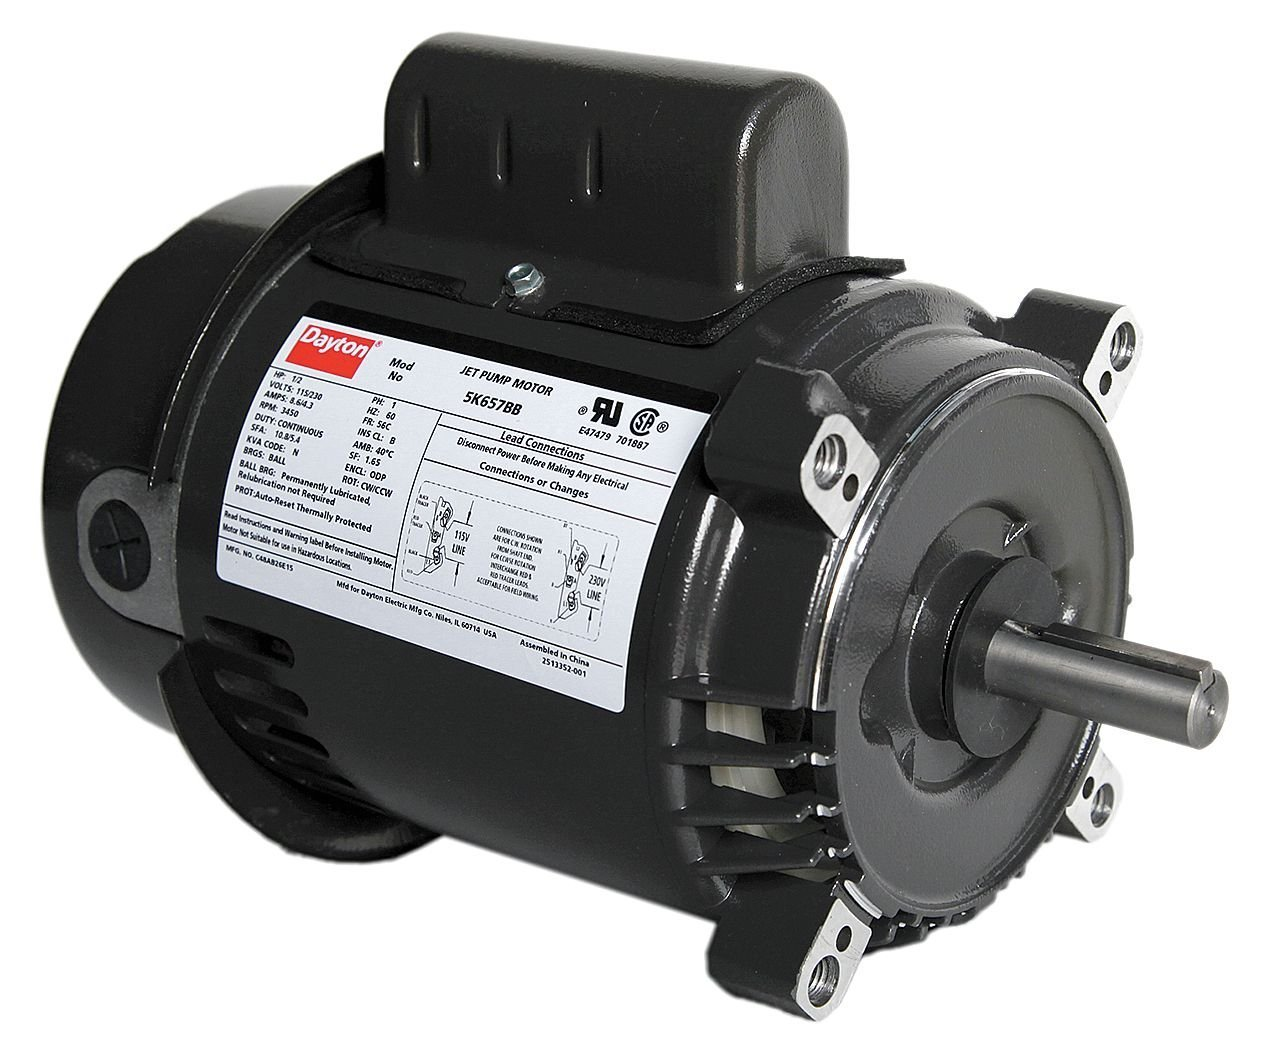 Dayton 5K657 Motor 1 2 hp Pump Degrees_Fahrenheit Jet Vol Product to Regular dealer